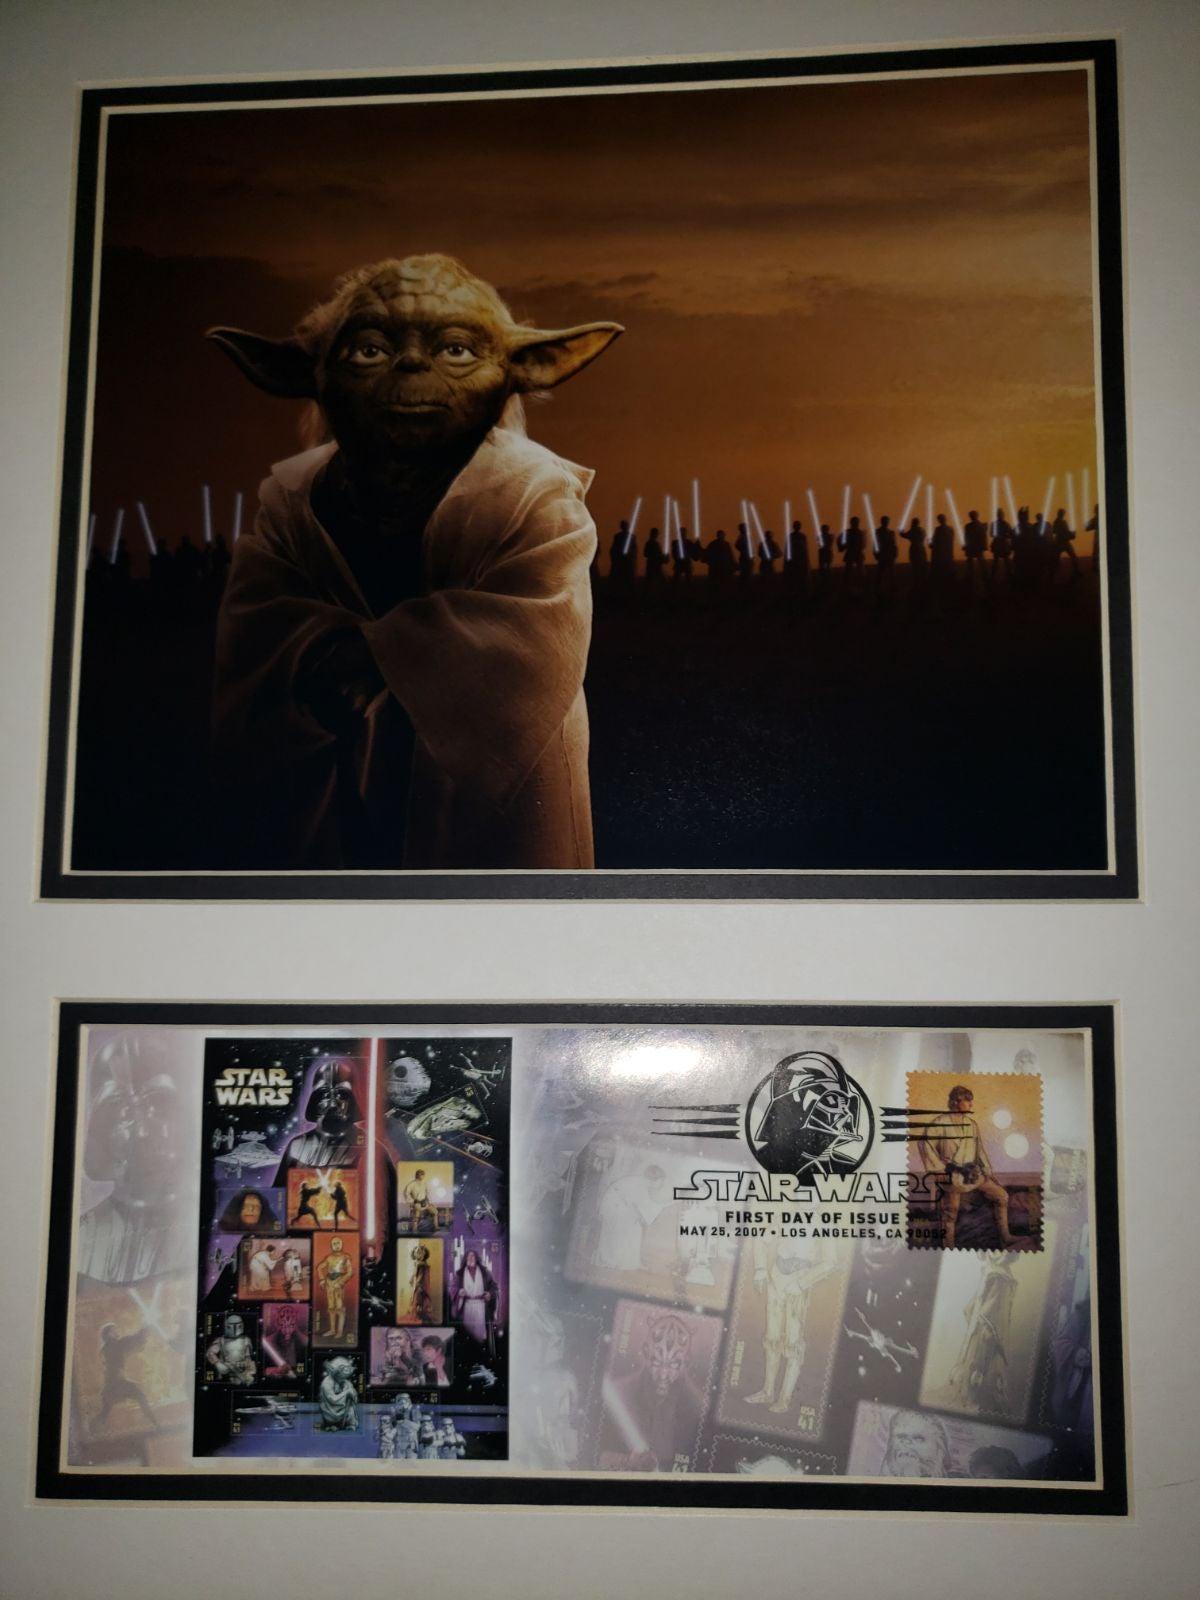 Yoda Postal Commemorative Print